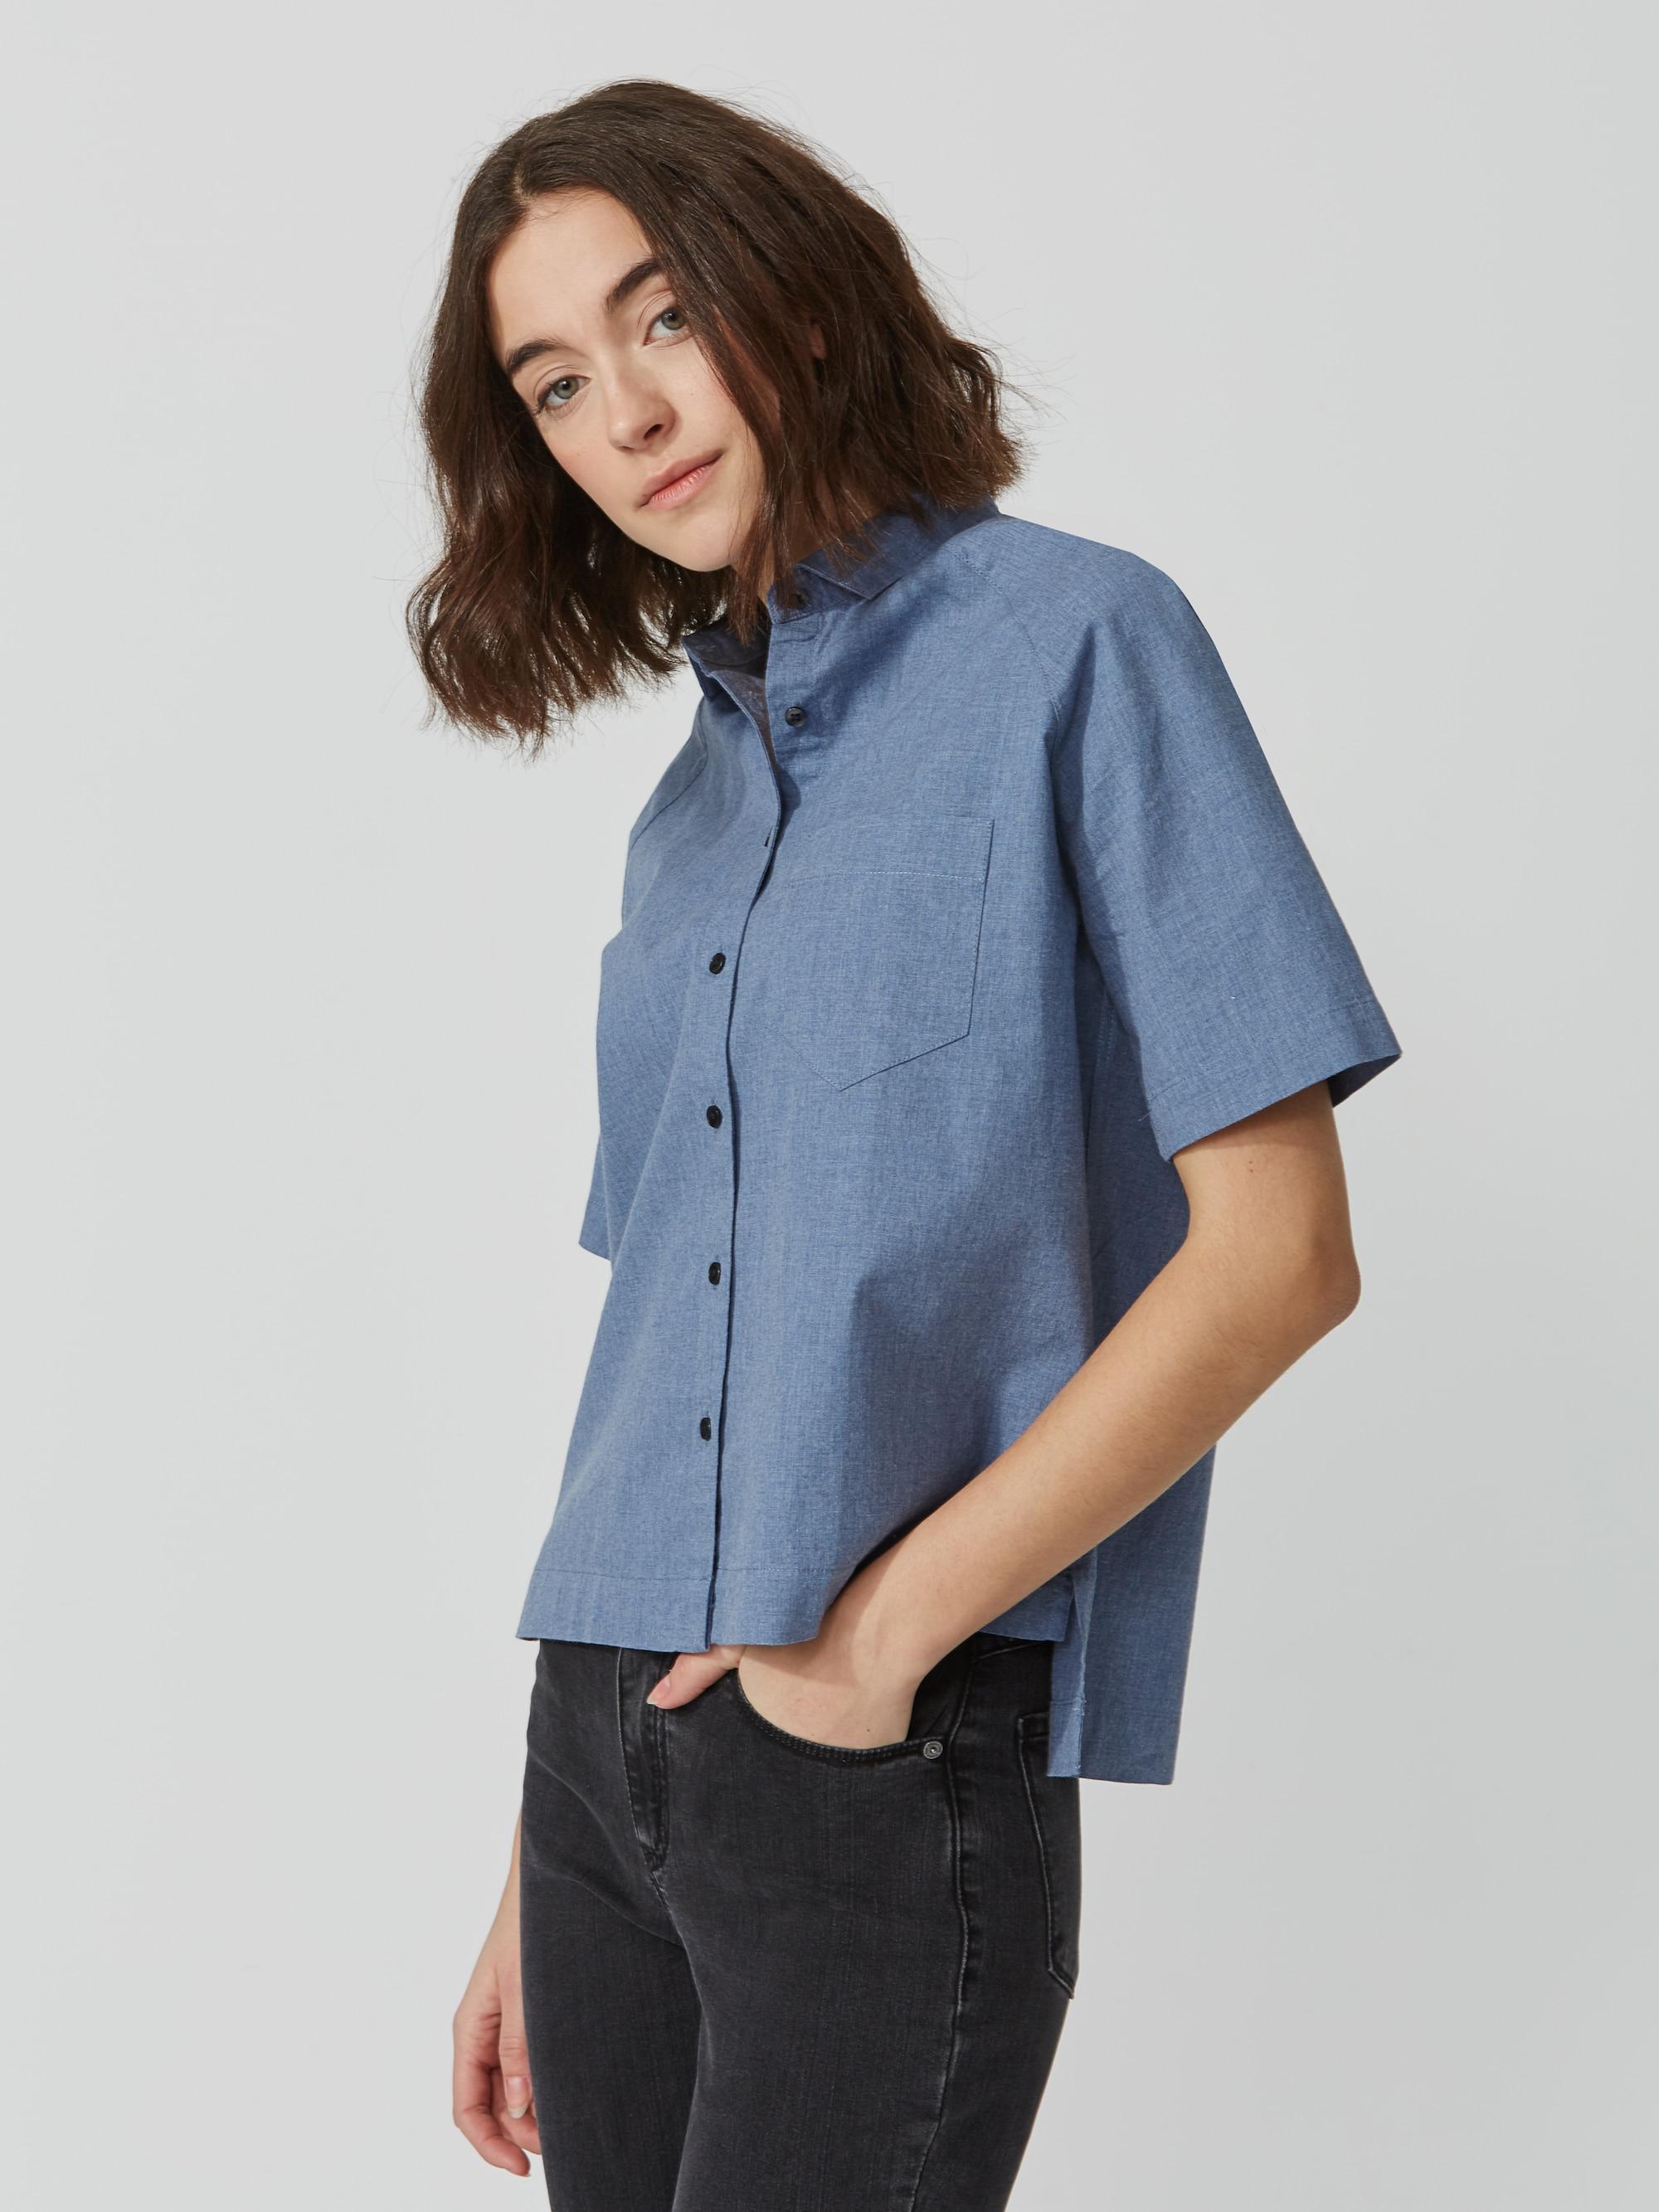 Frank oak midi oxford shirt in midnight blue heather in for Frank and oak shirt